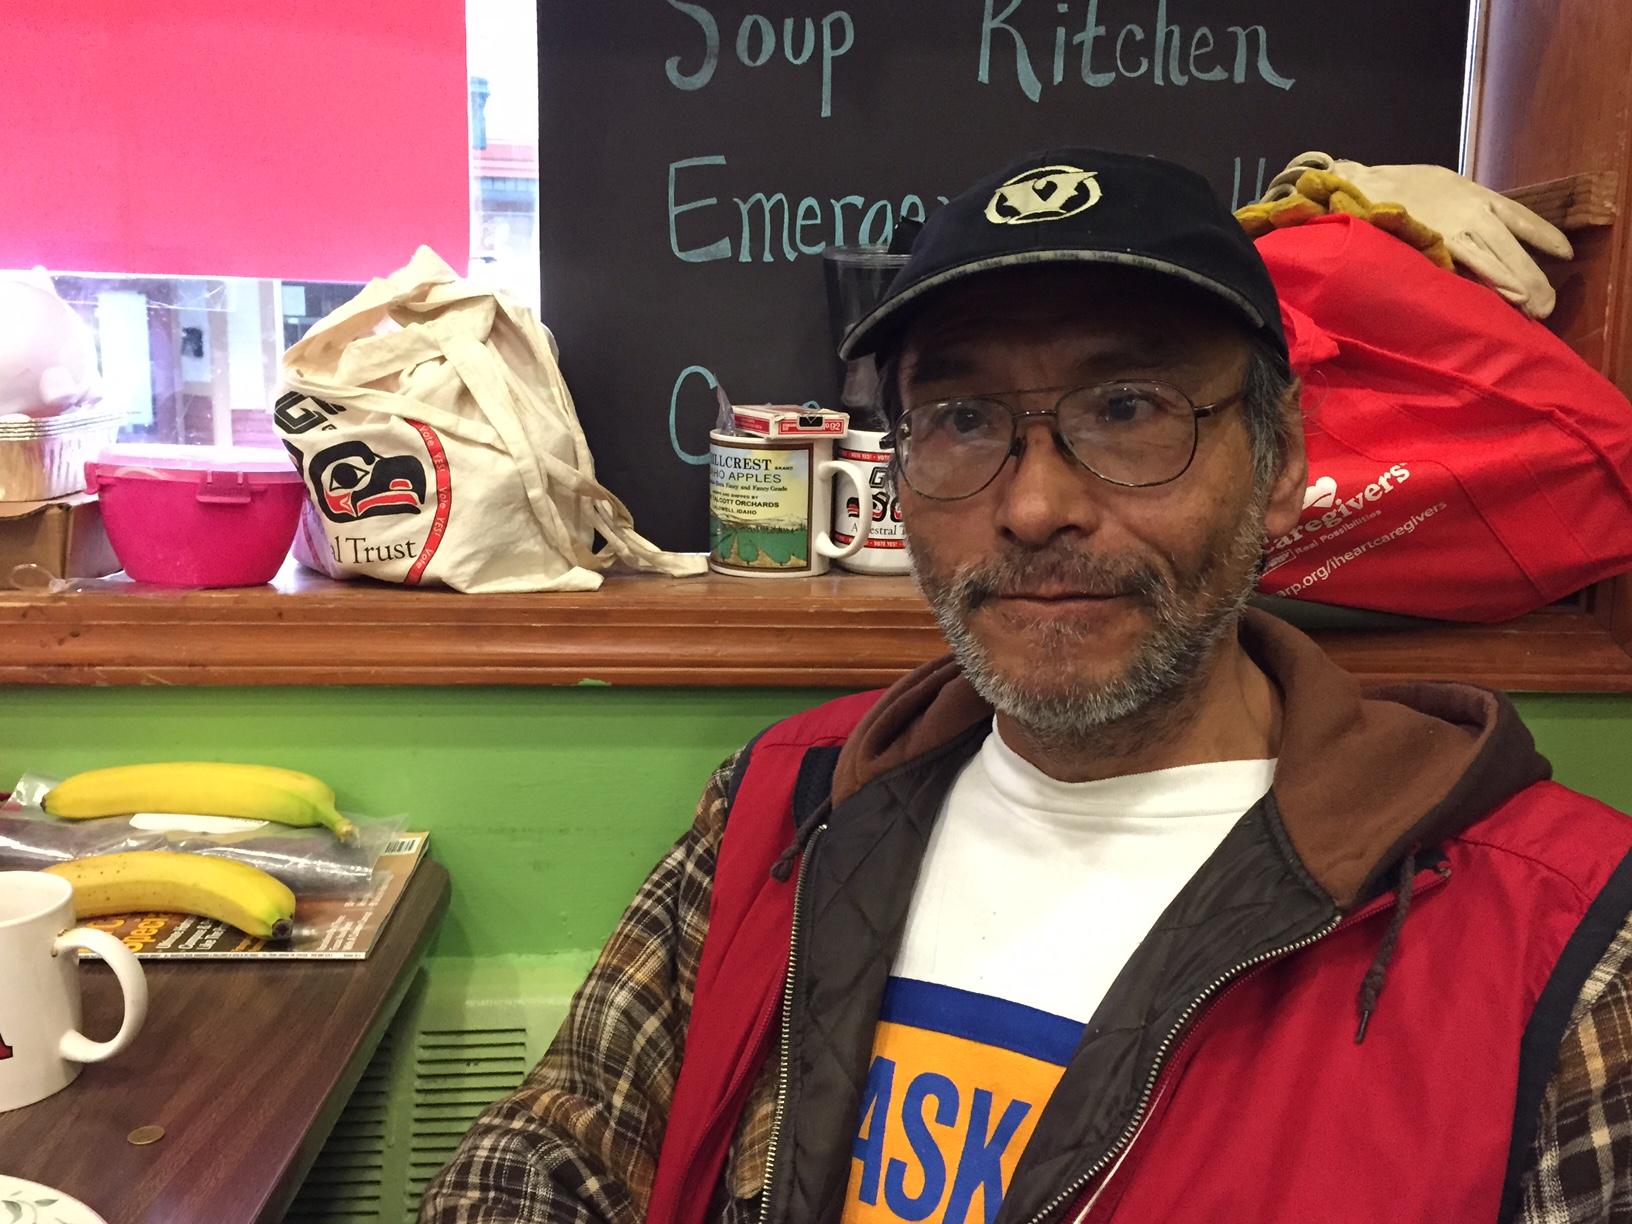 Clyde Didrickson says he's been homeless since 1981. (Photo by Lisa Phu/KTOO)